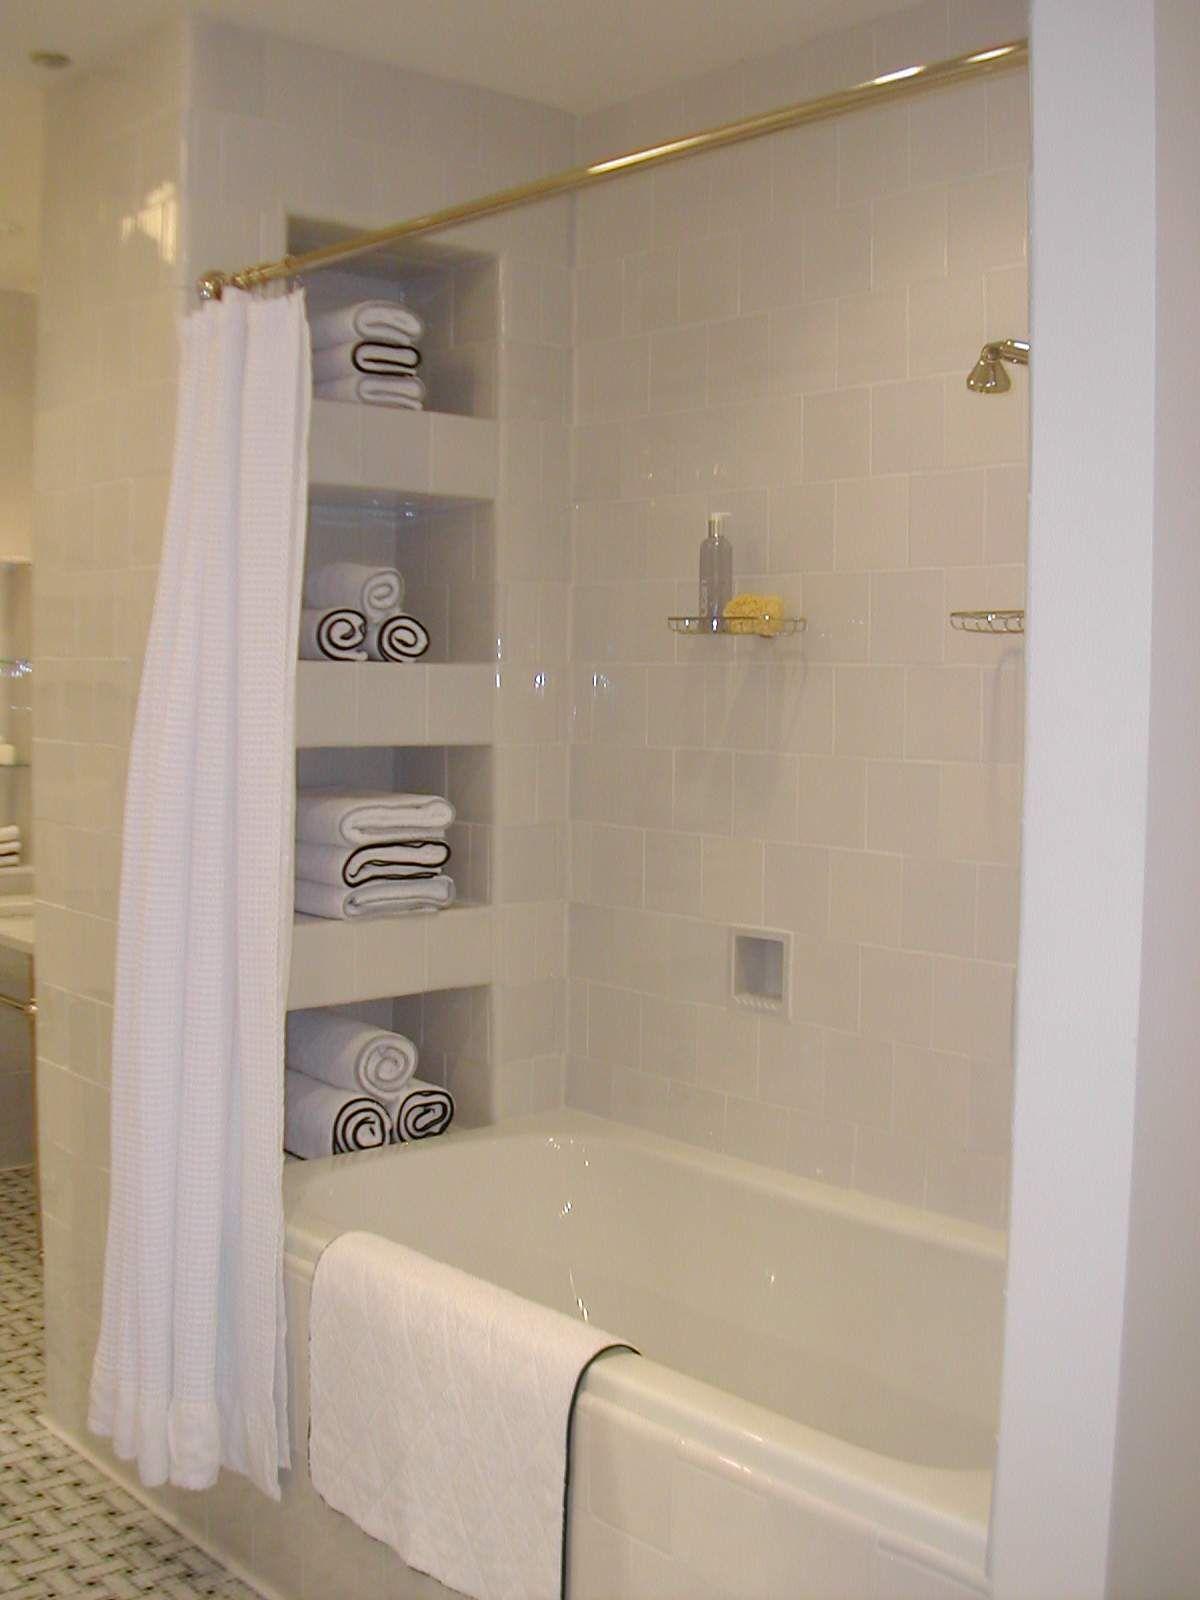 My Favorite Pumice Room Waterworks Chicago Showroom Display - Bathroom design showroom chicago